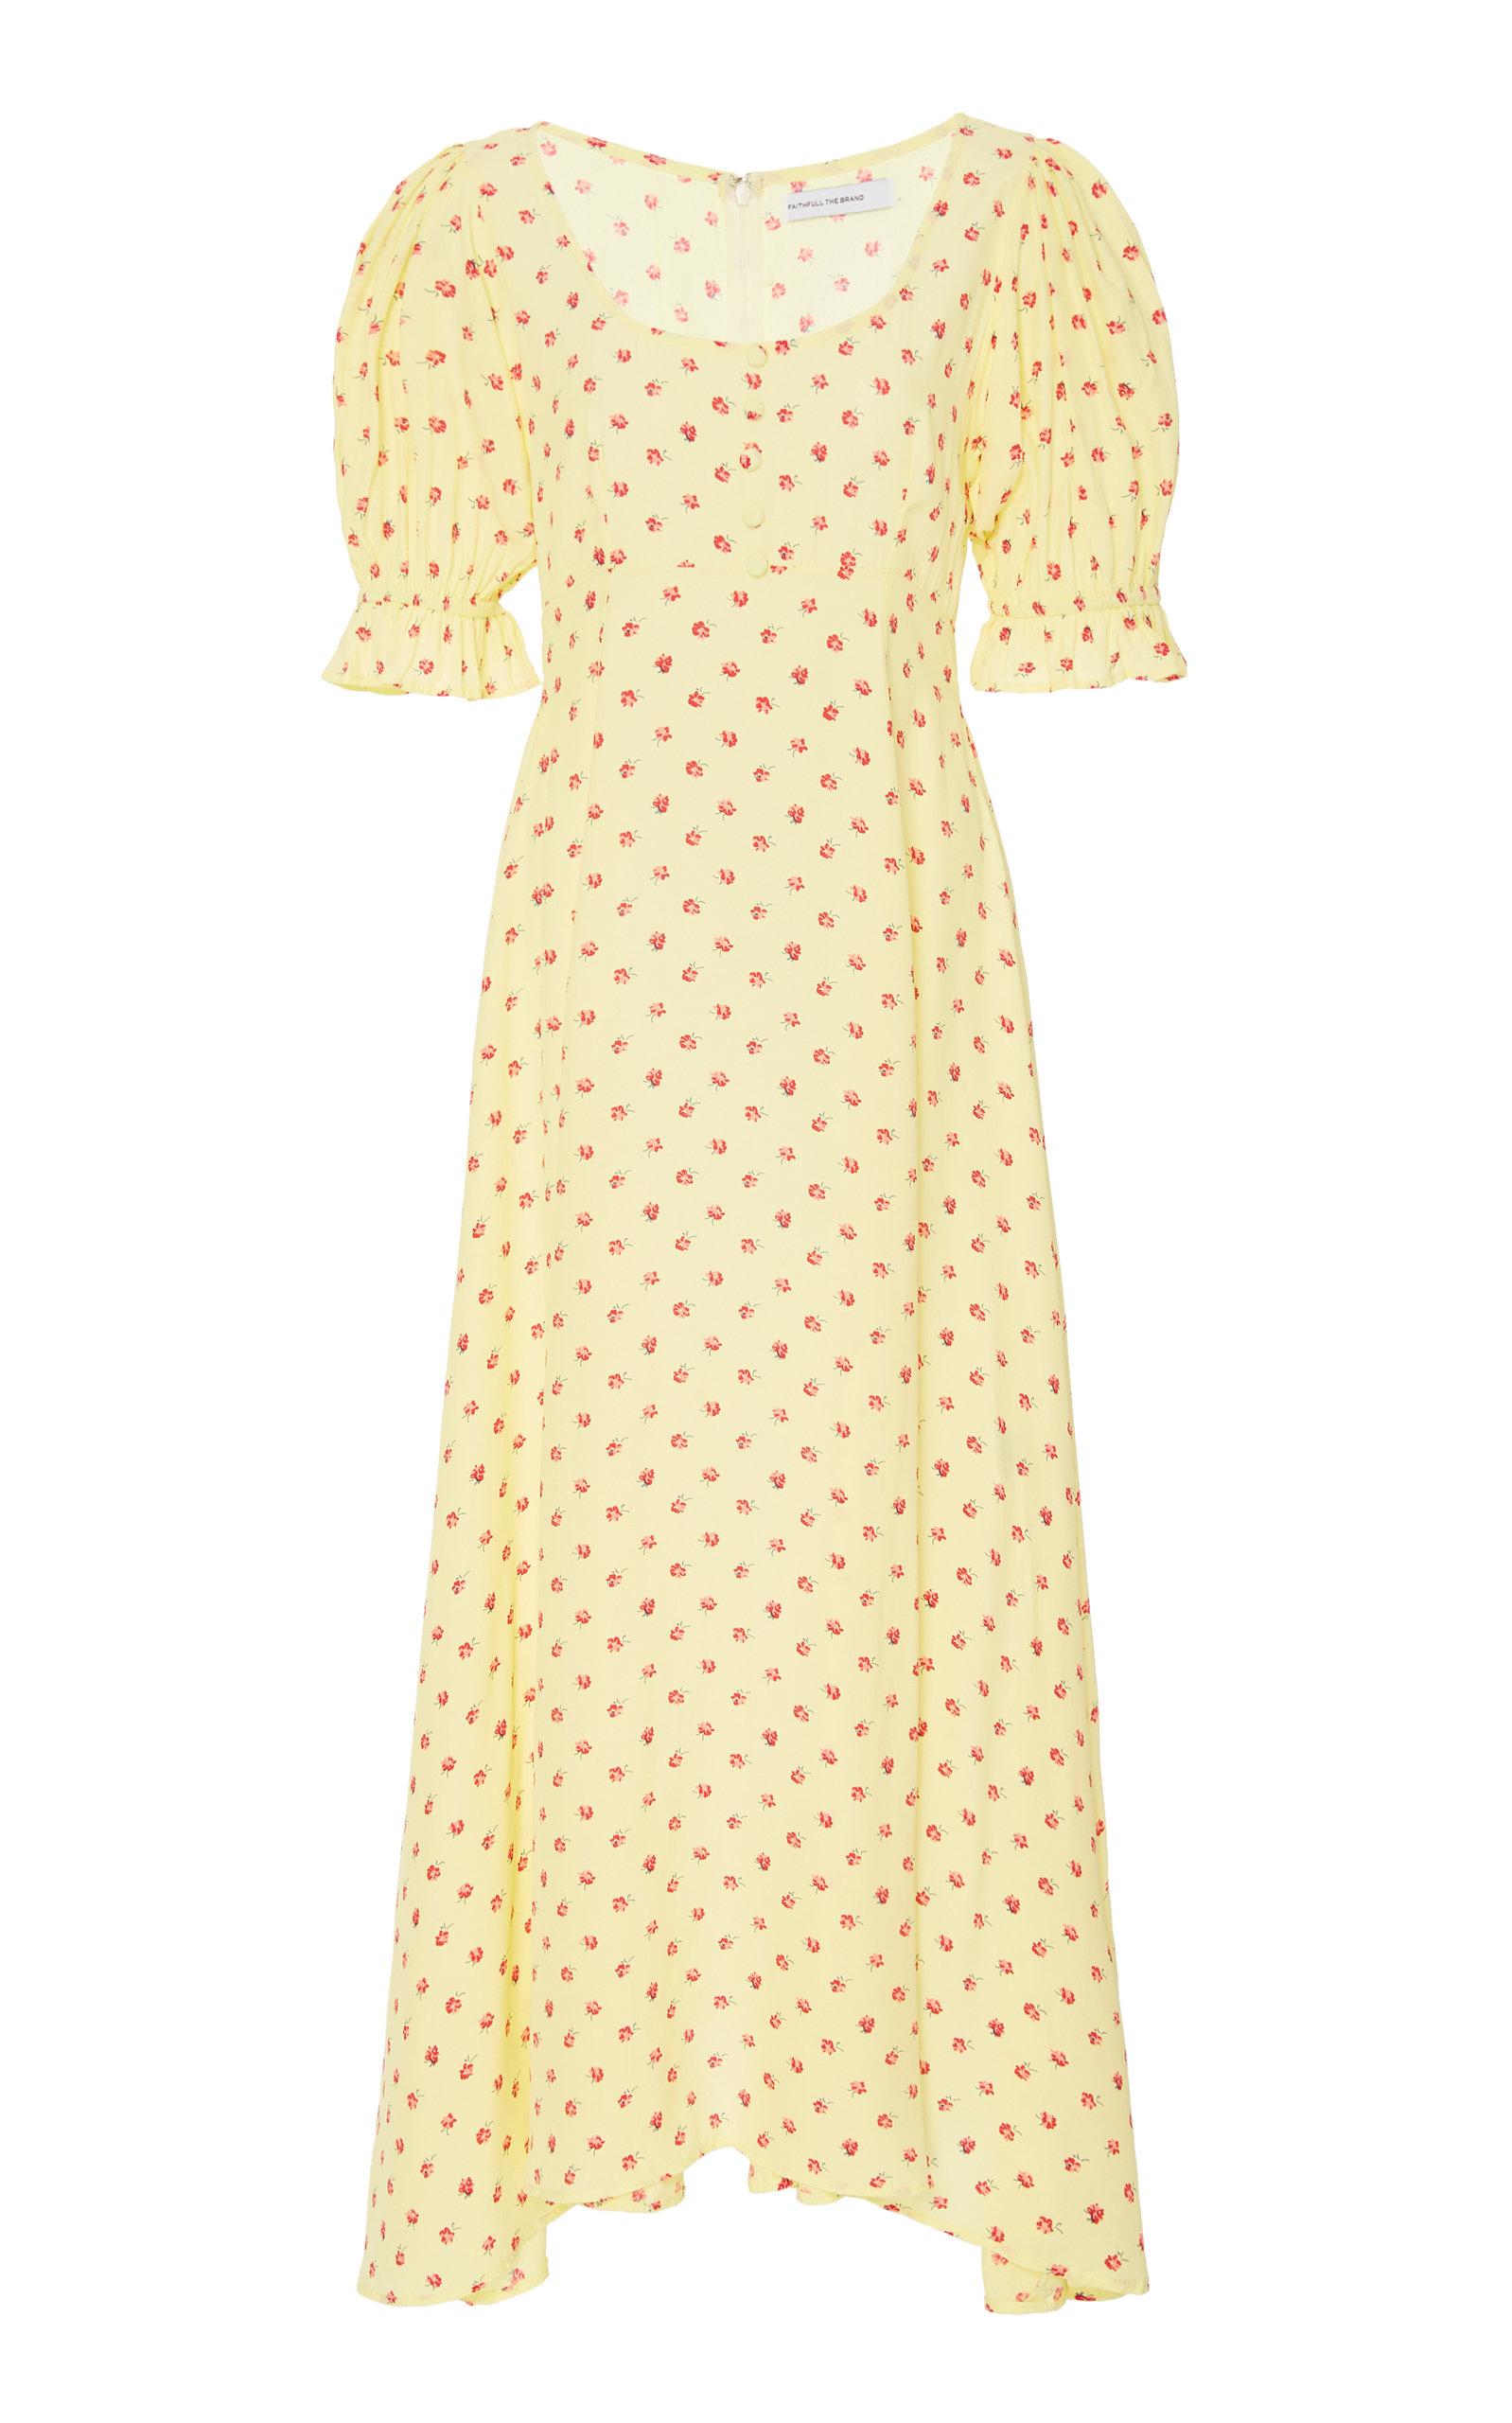 Buy Faithfull The Brand Linnie Floral-Print Crepe Midi Dress online, shop Faithfull The Brand at the best price